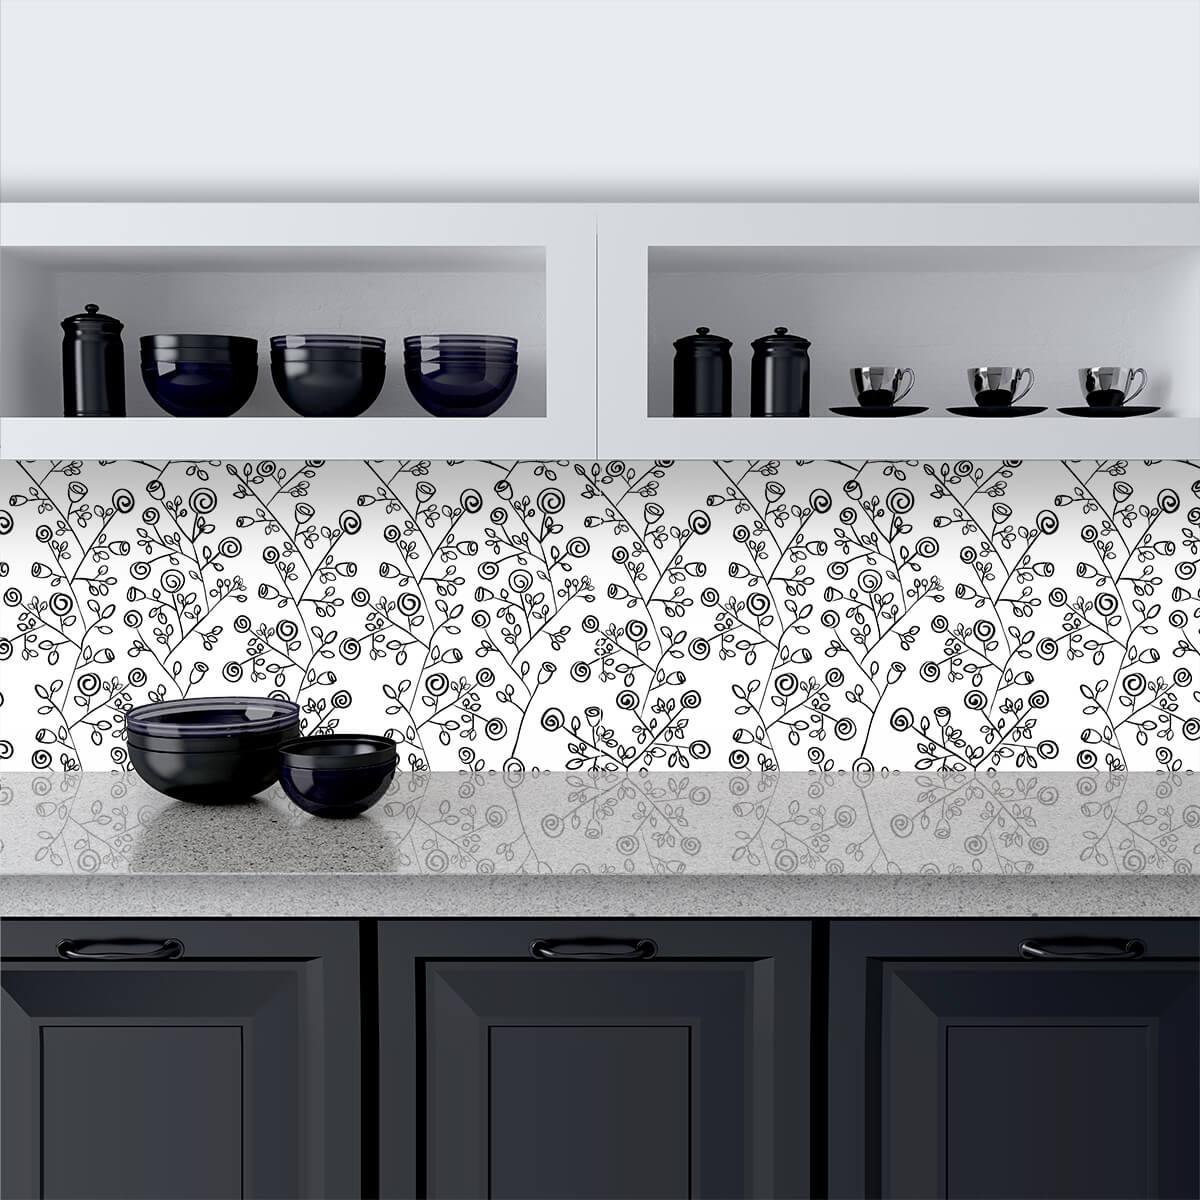 Küchenrückwand aus Glas Black Roses